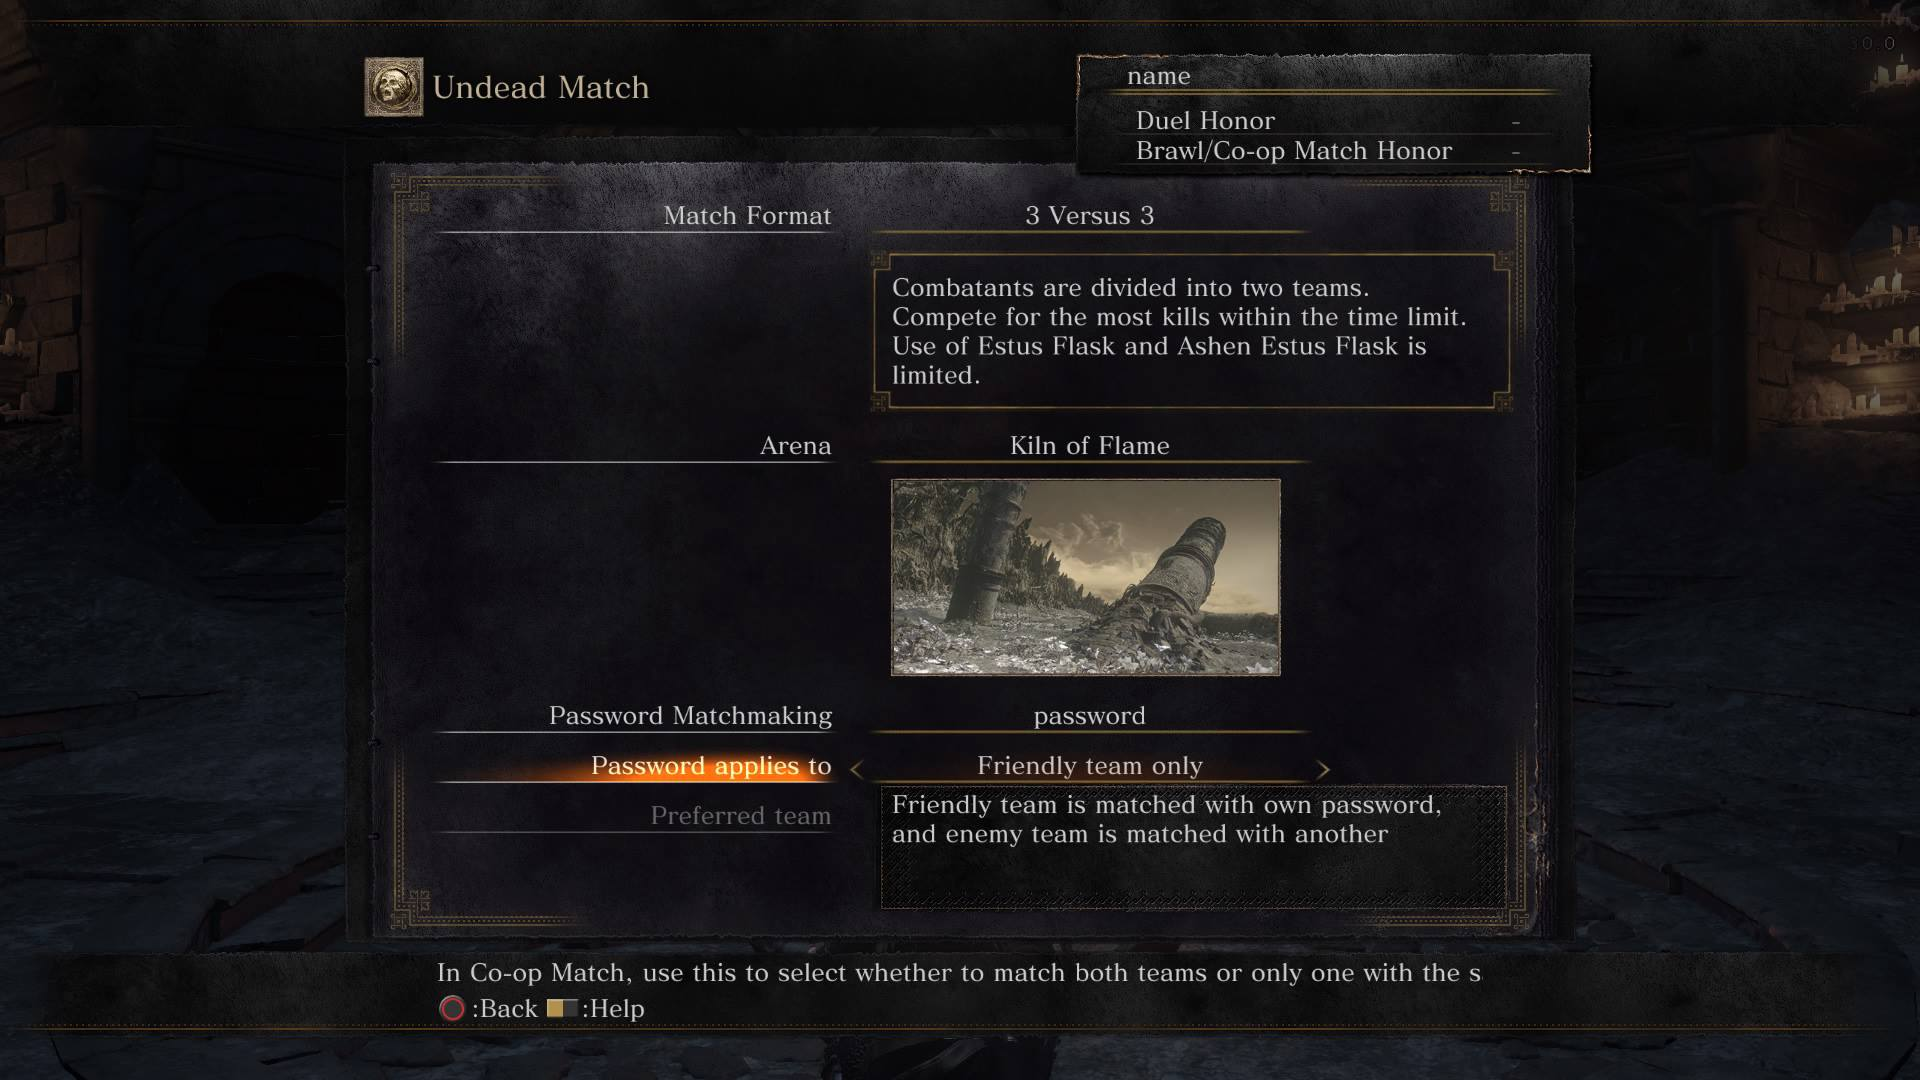 Dark souls 1 matchmaking